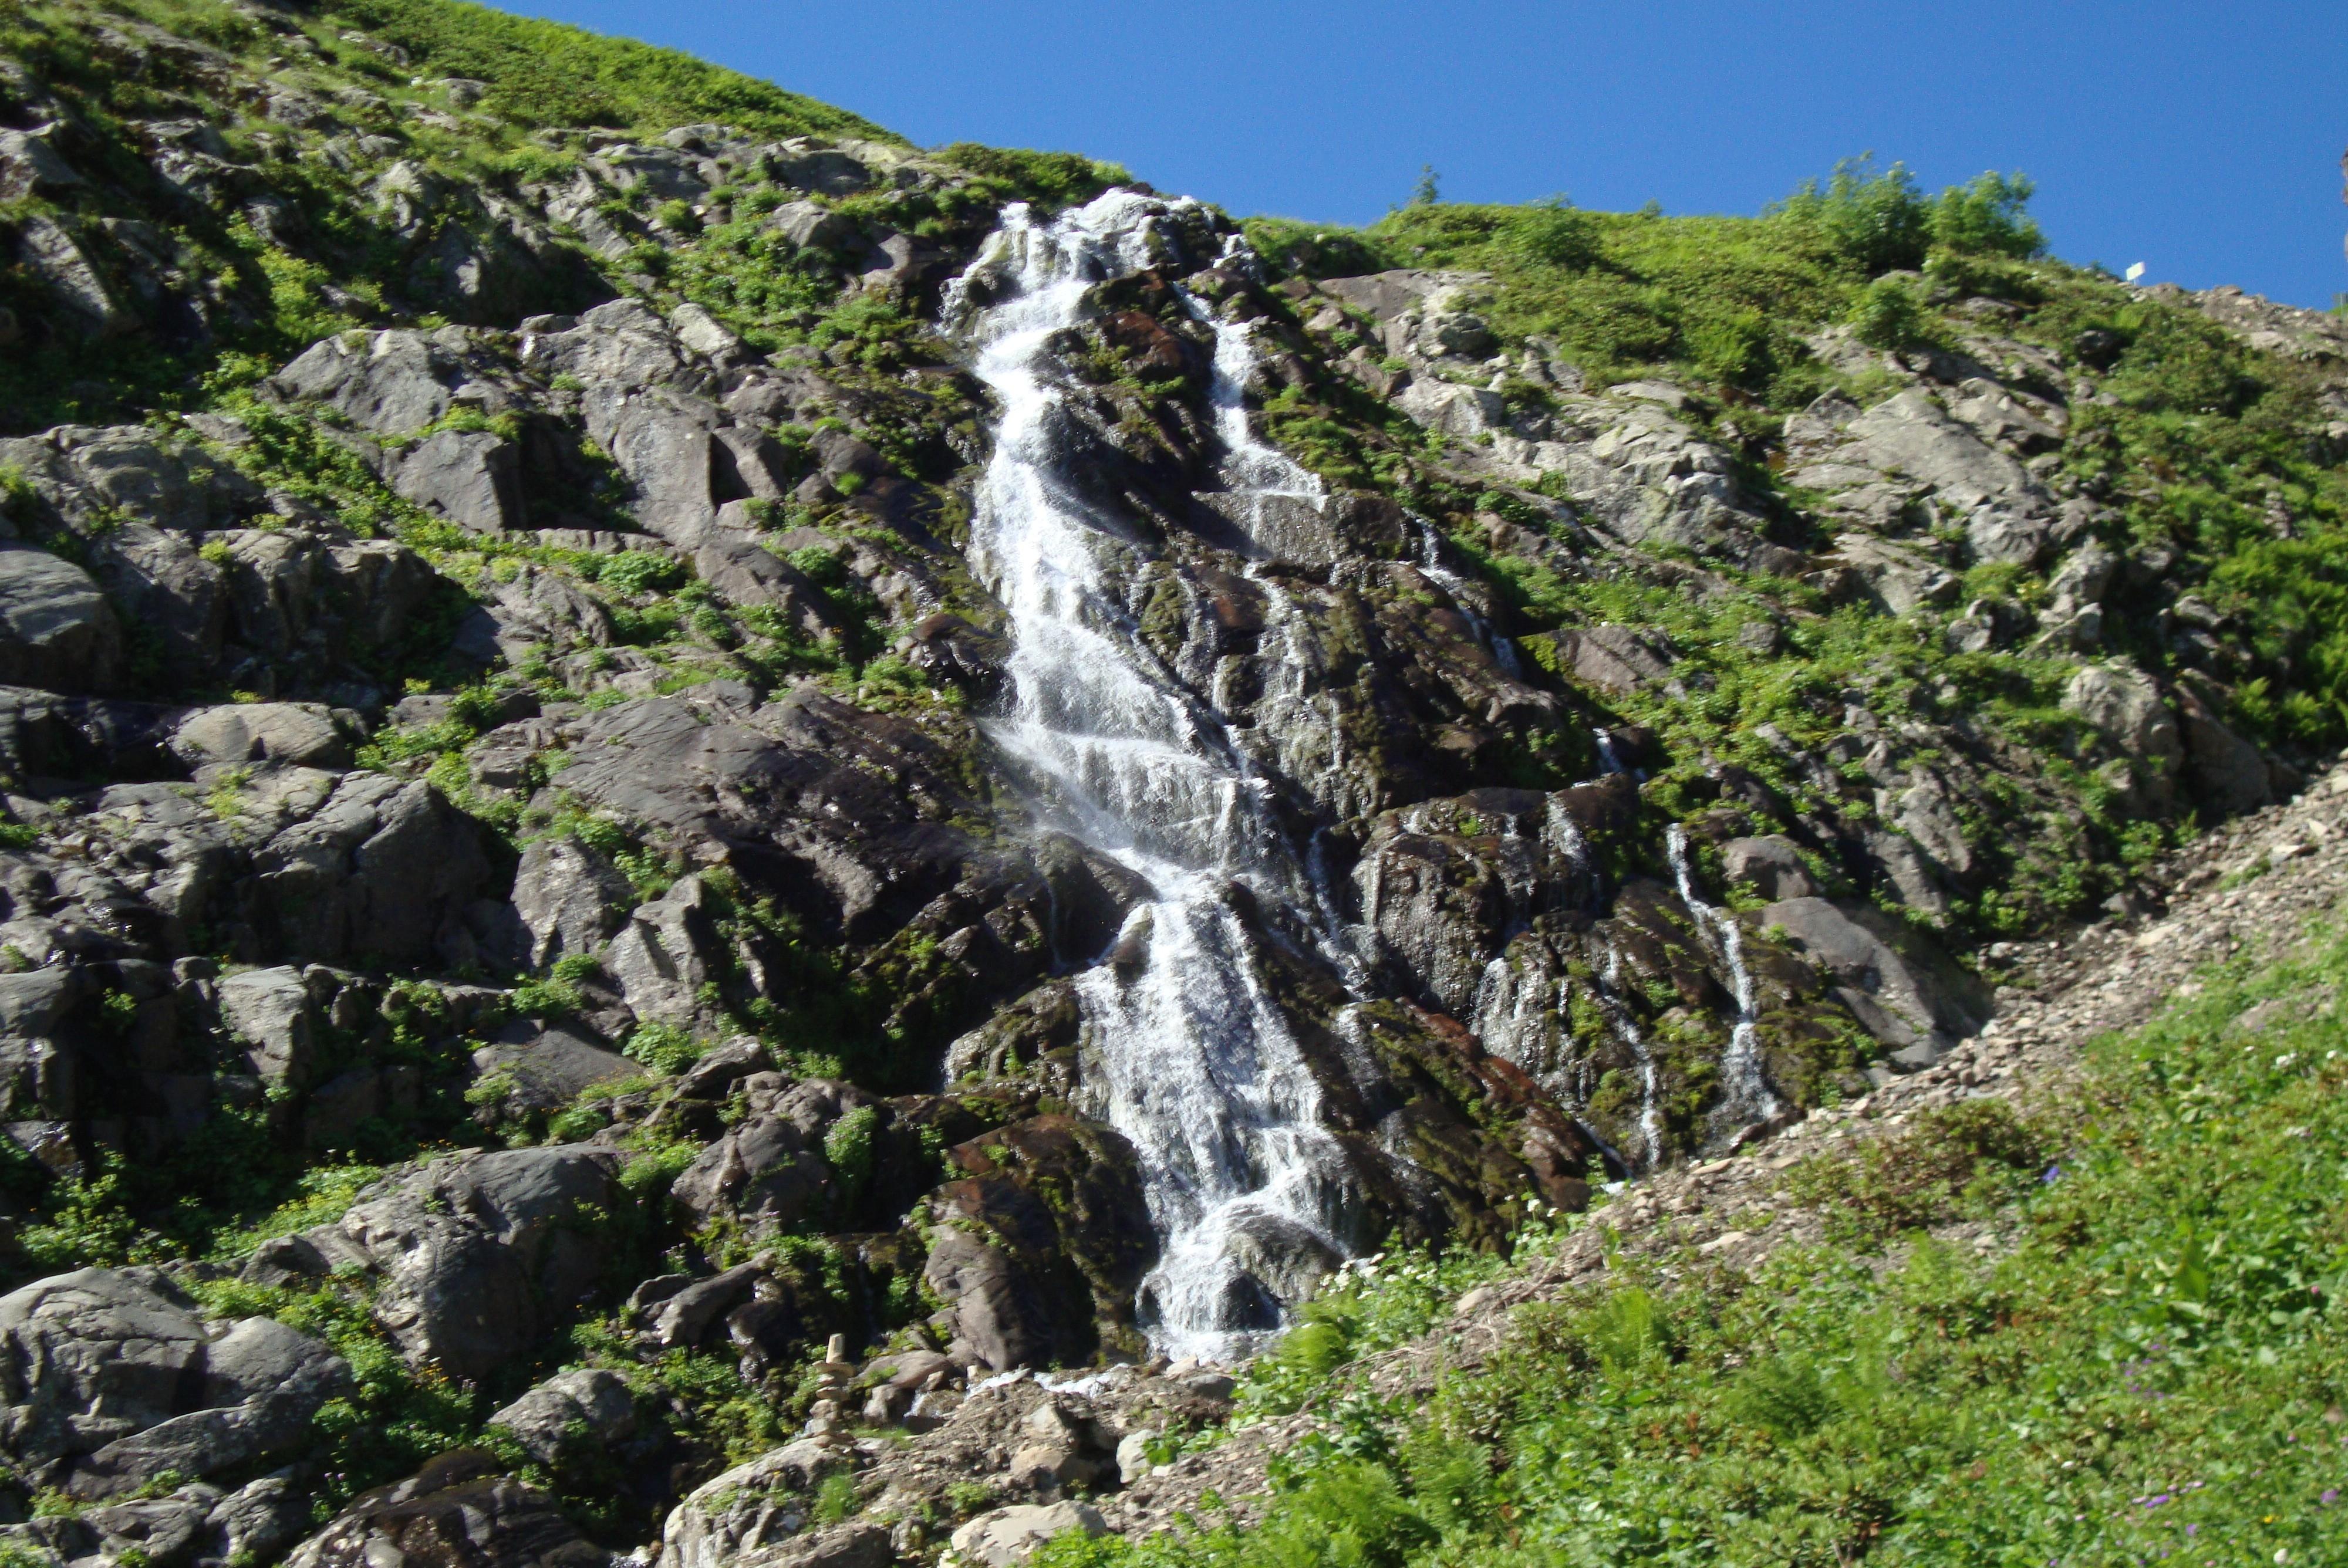 Фото: Поход: водопад Медвежий и Поликаря